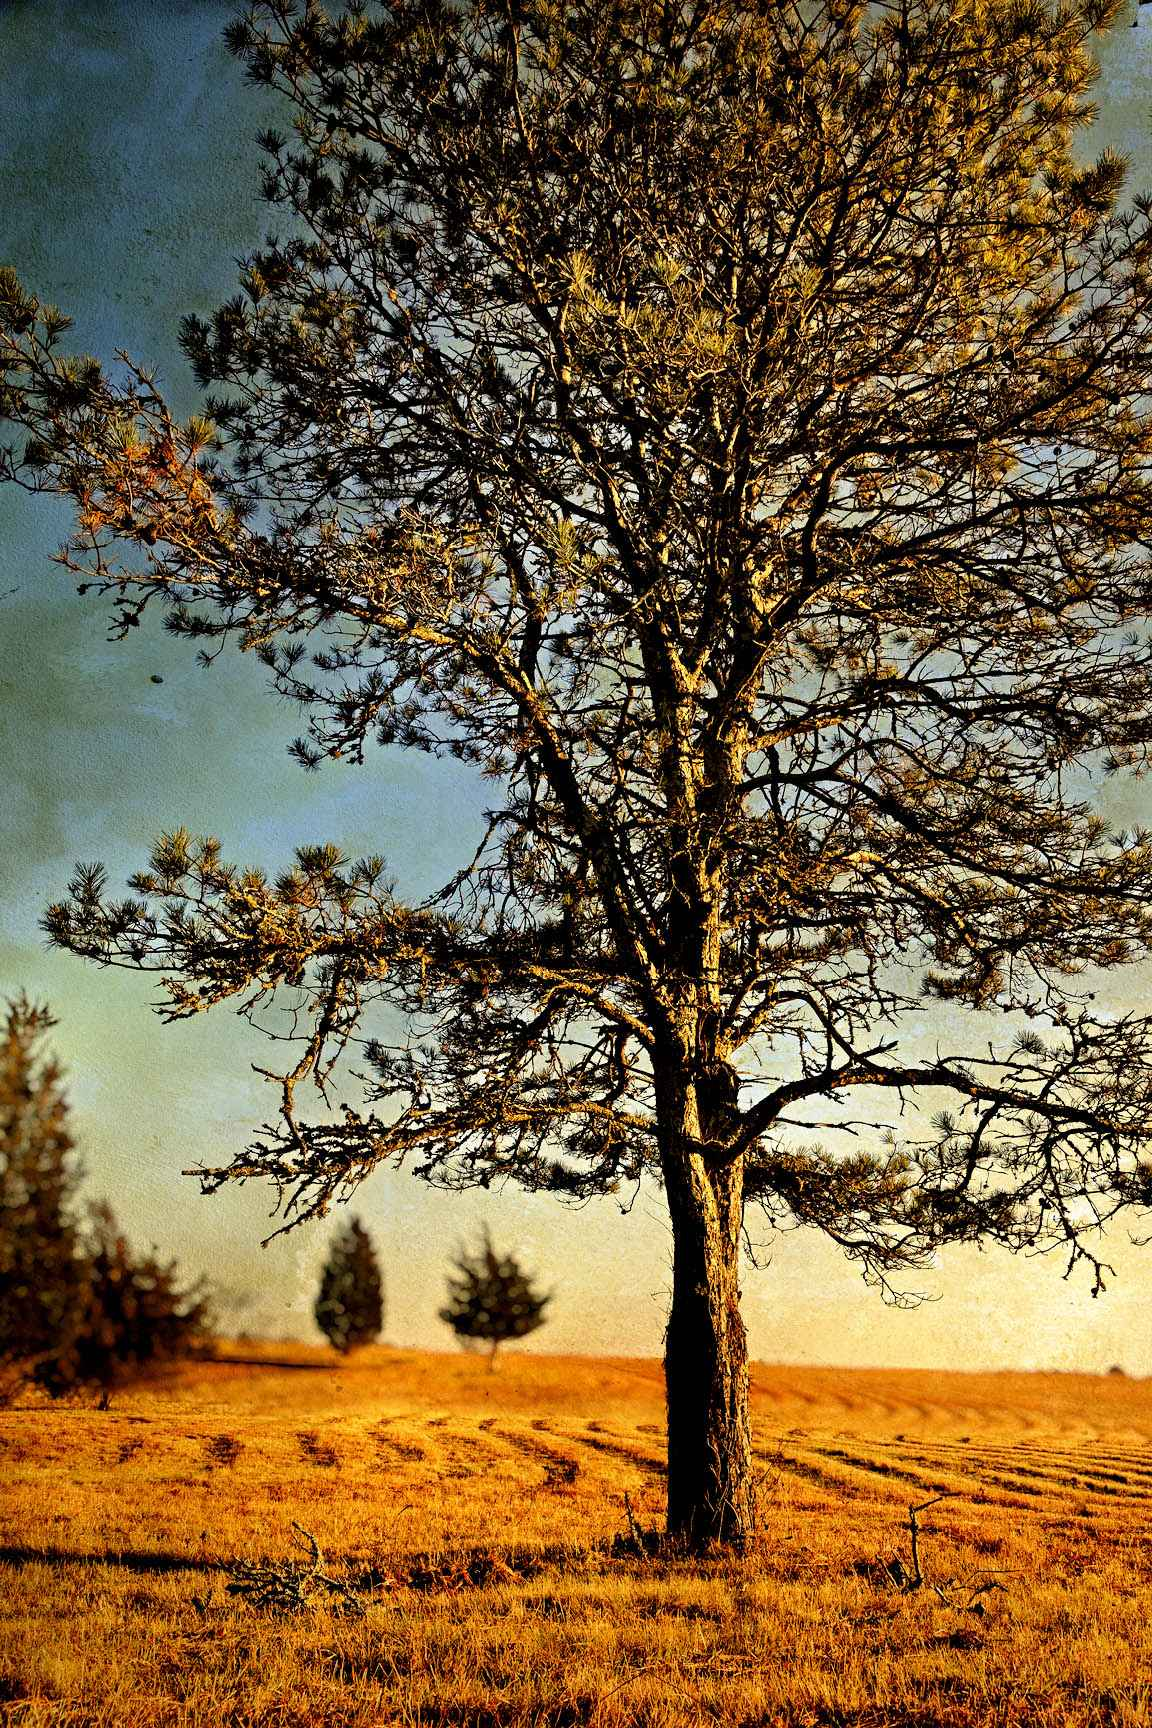 Autumn Light 3 by  Michael Stimola - Masterpiece Online